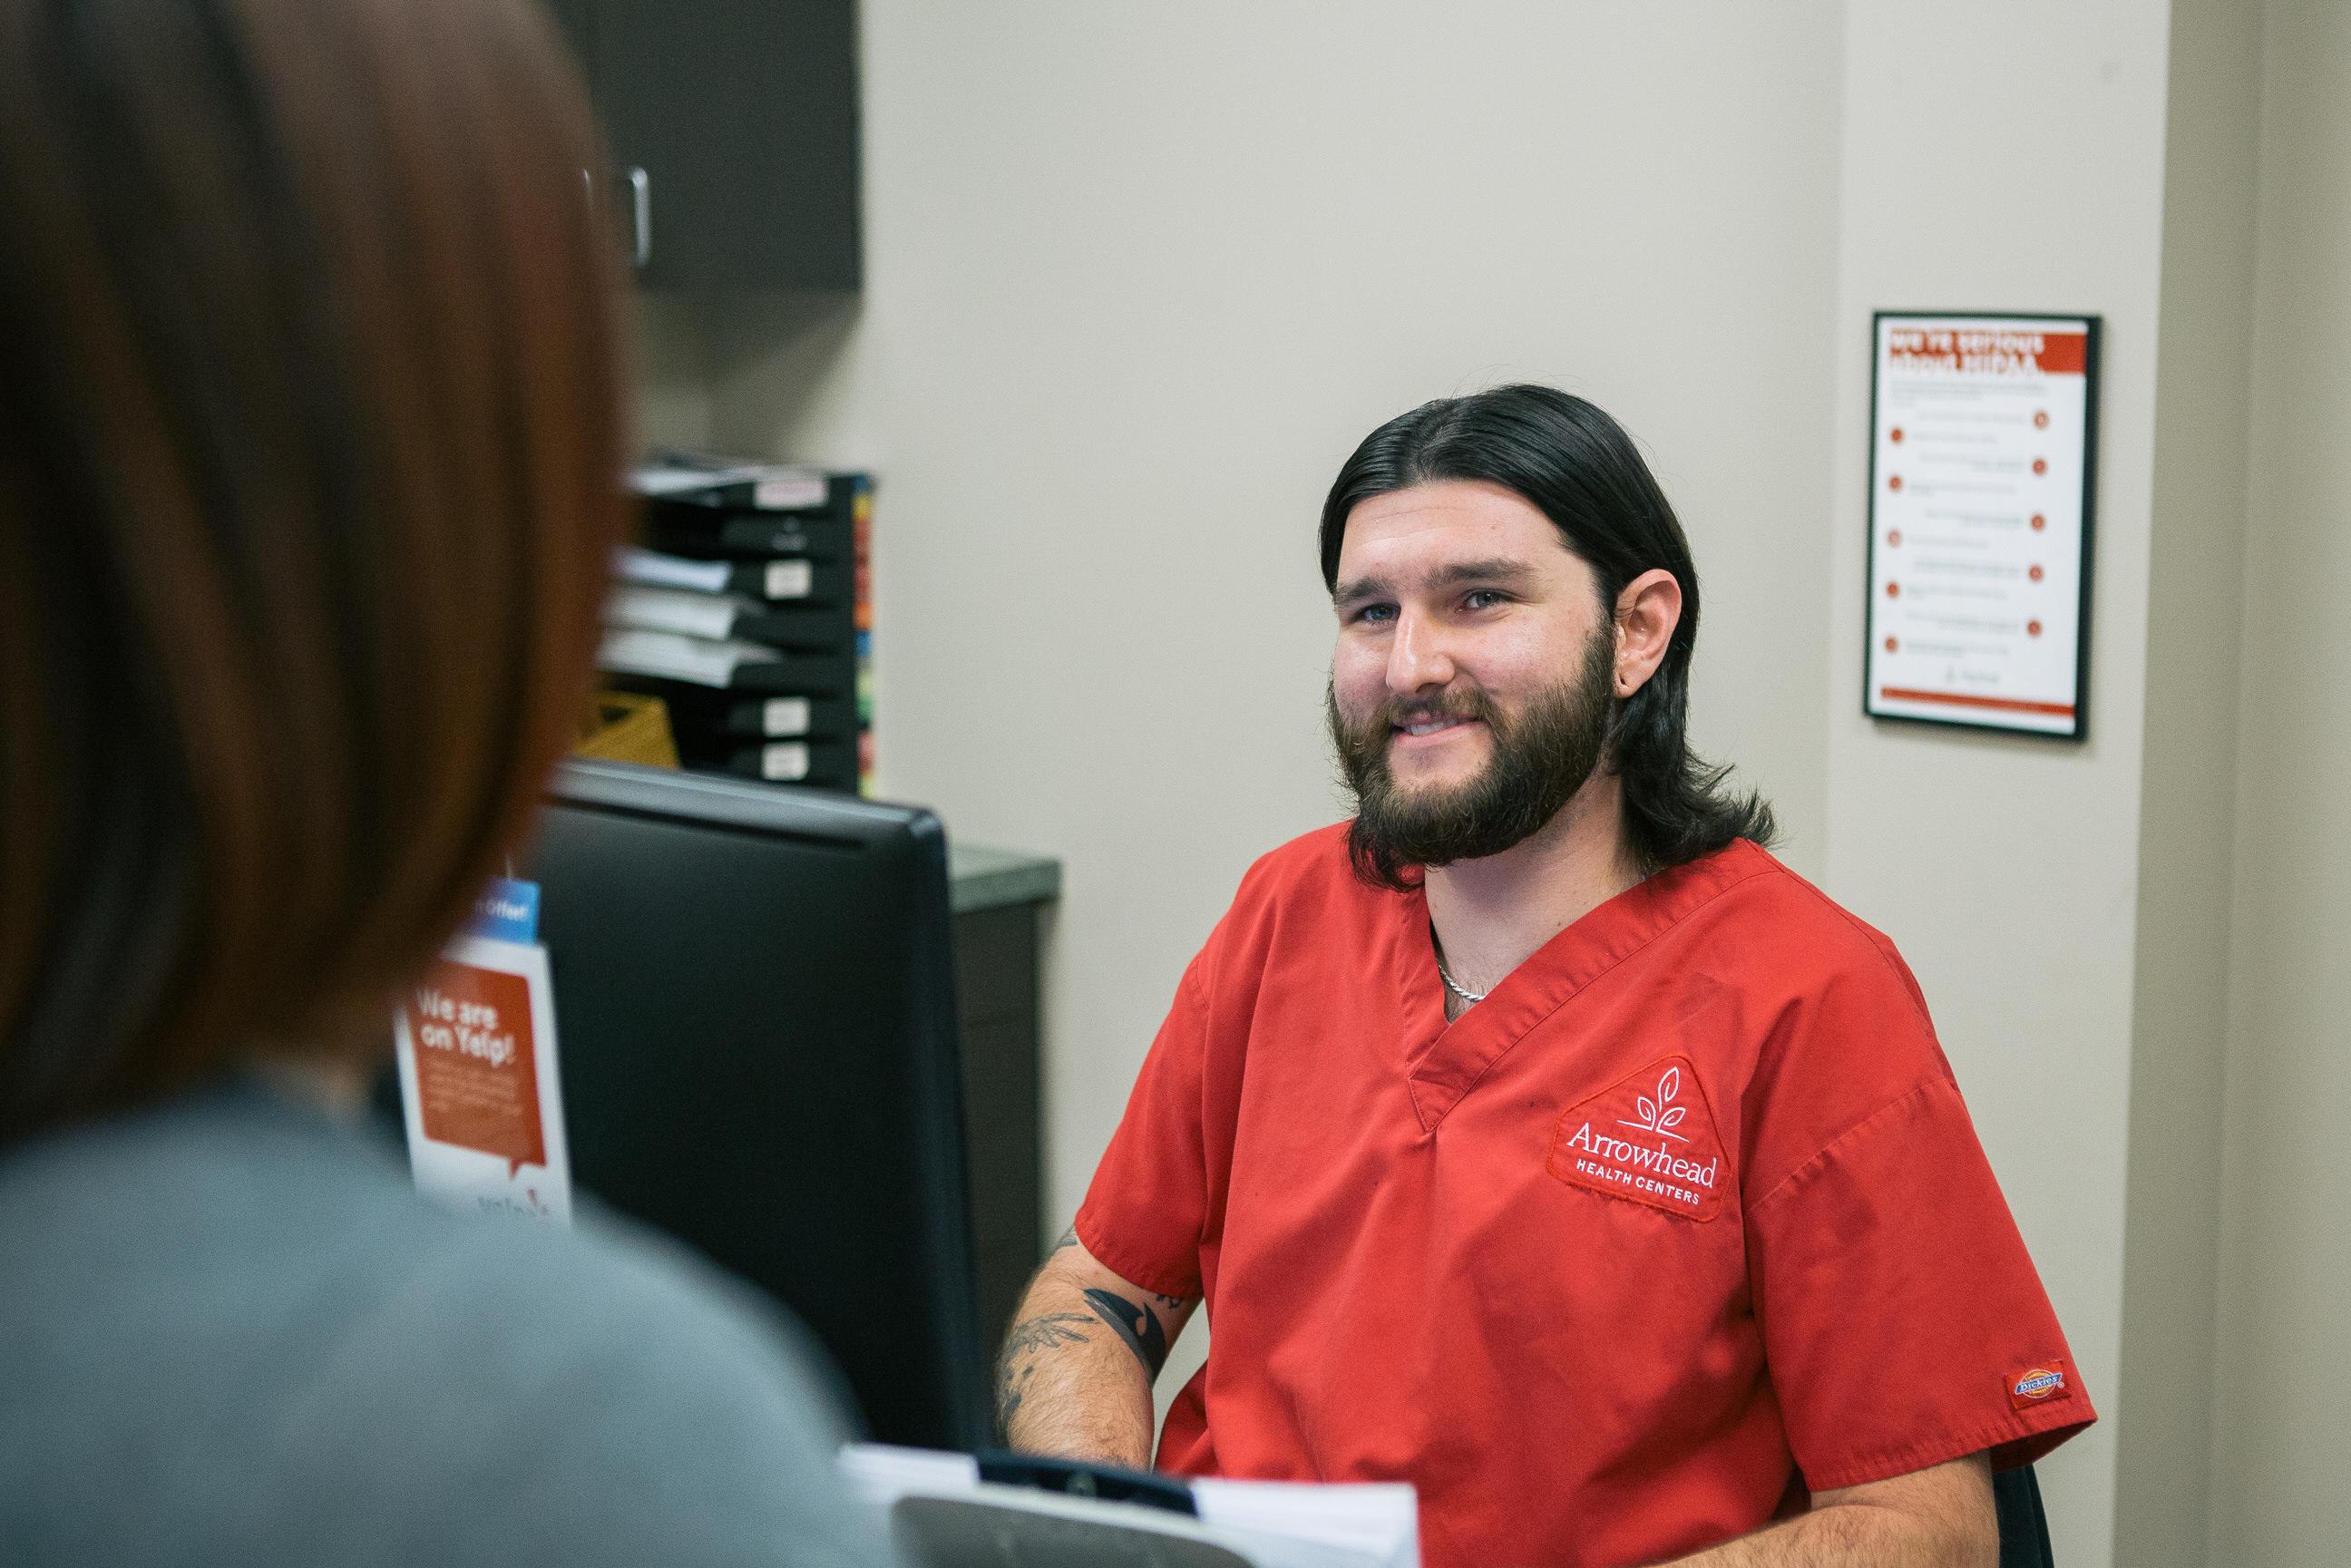 Arrowhead Health Centers image 5